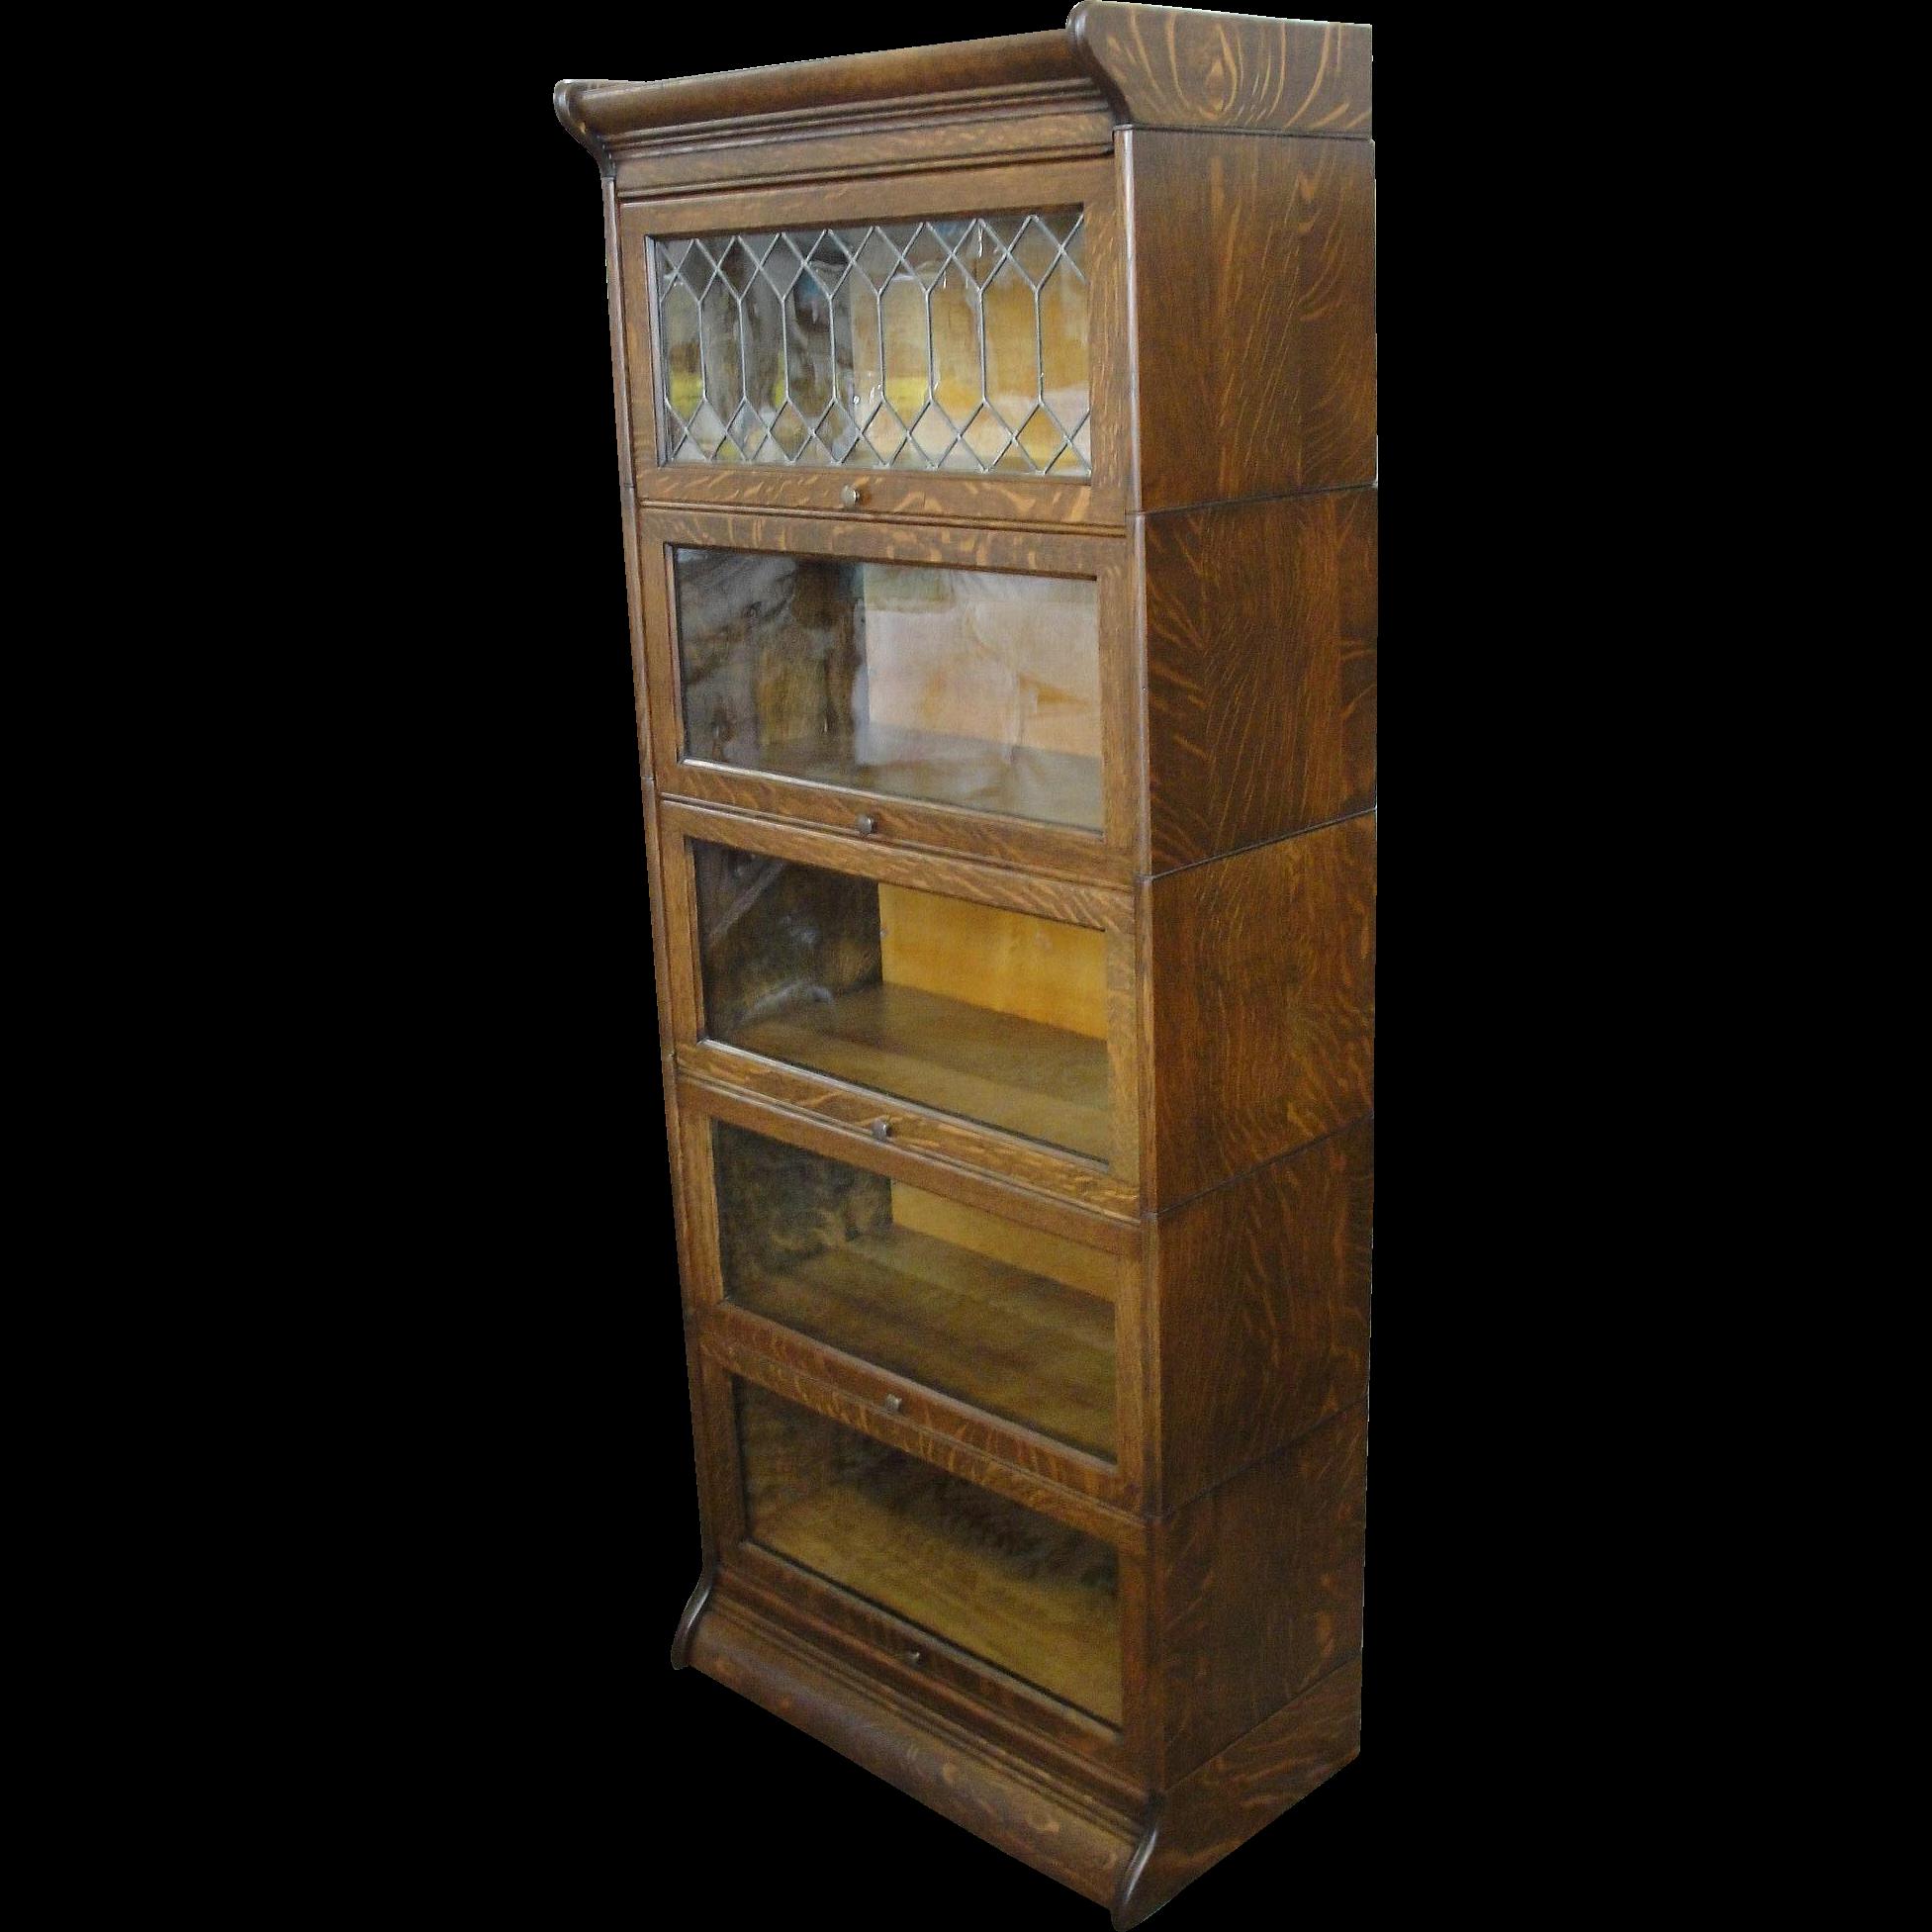 Gunn Quarter Sawn Oak 190 Size Stacking Barrister Bookcase